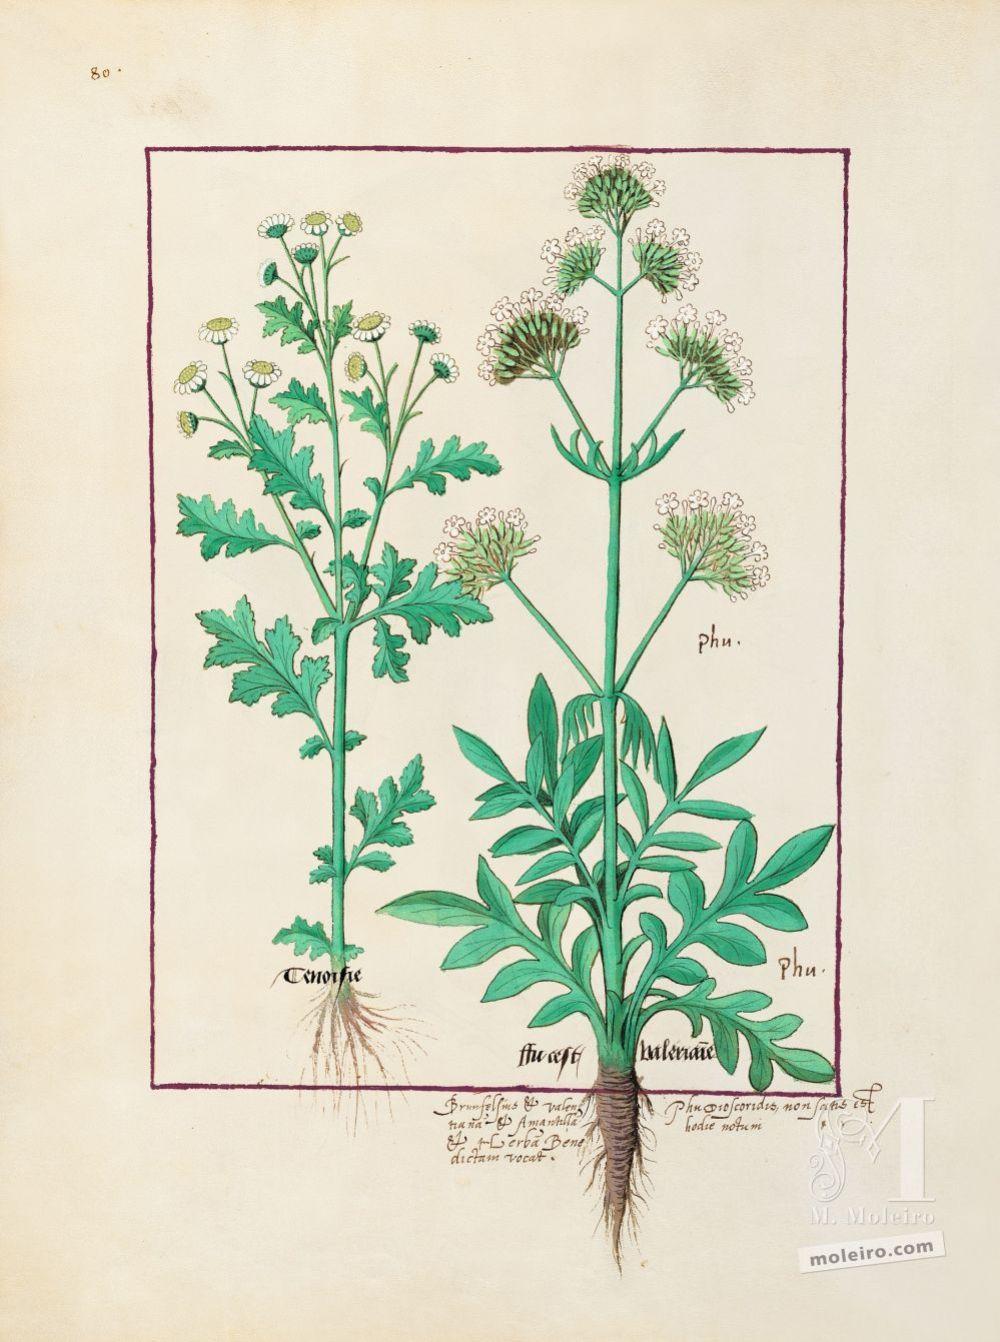 Carpeta 5 folios del Libro de los Medicamentos Simples (s. XV)  Folio 151v, Valeriana (Phu, Fu, Valerianne)